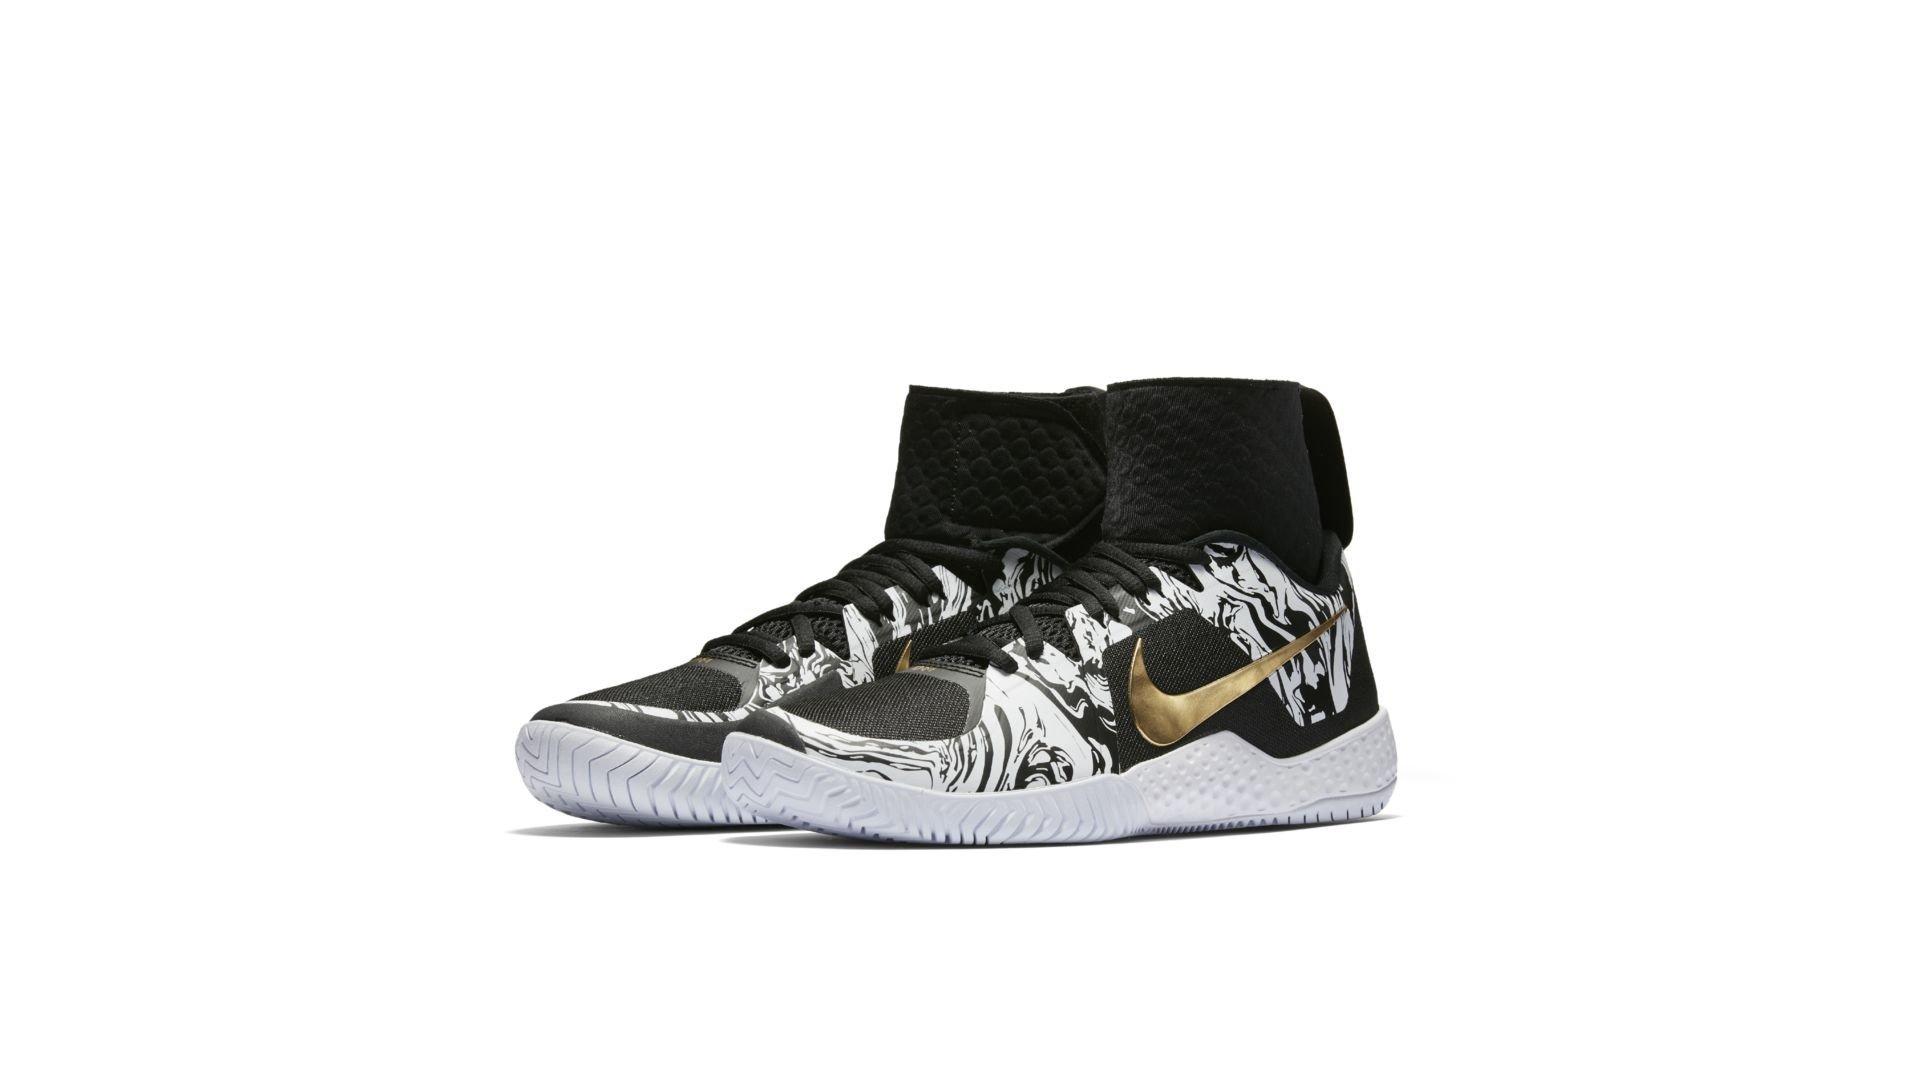 Nike Court Flare BHM 2017 (W) (848453-100)